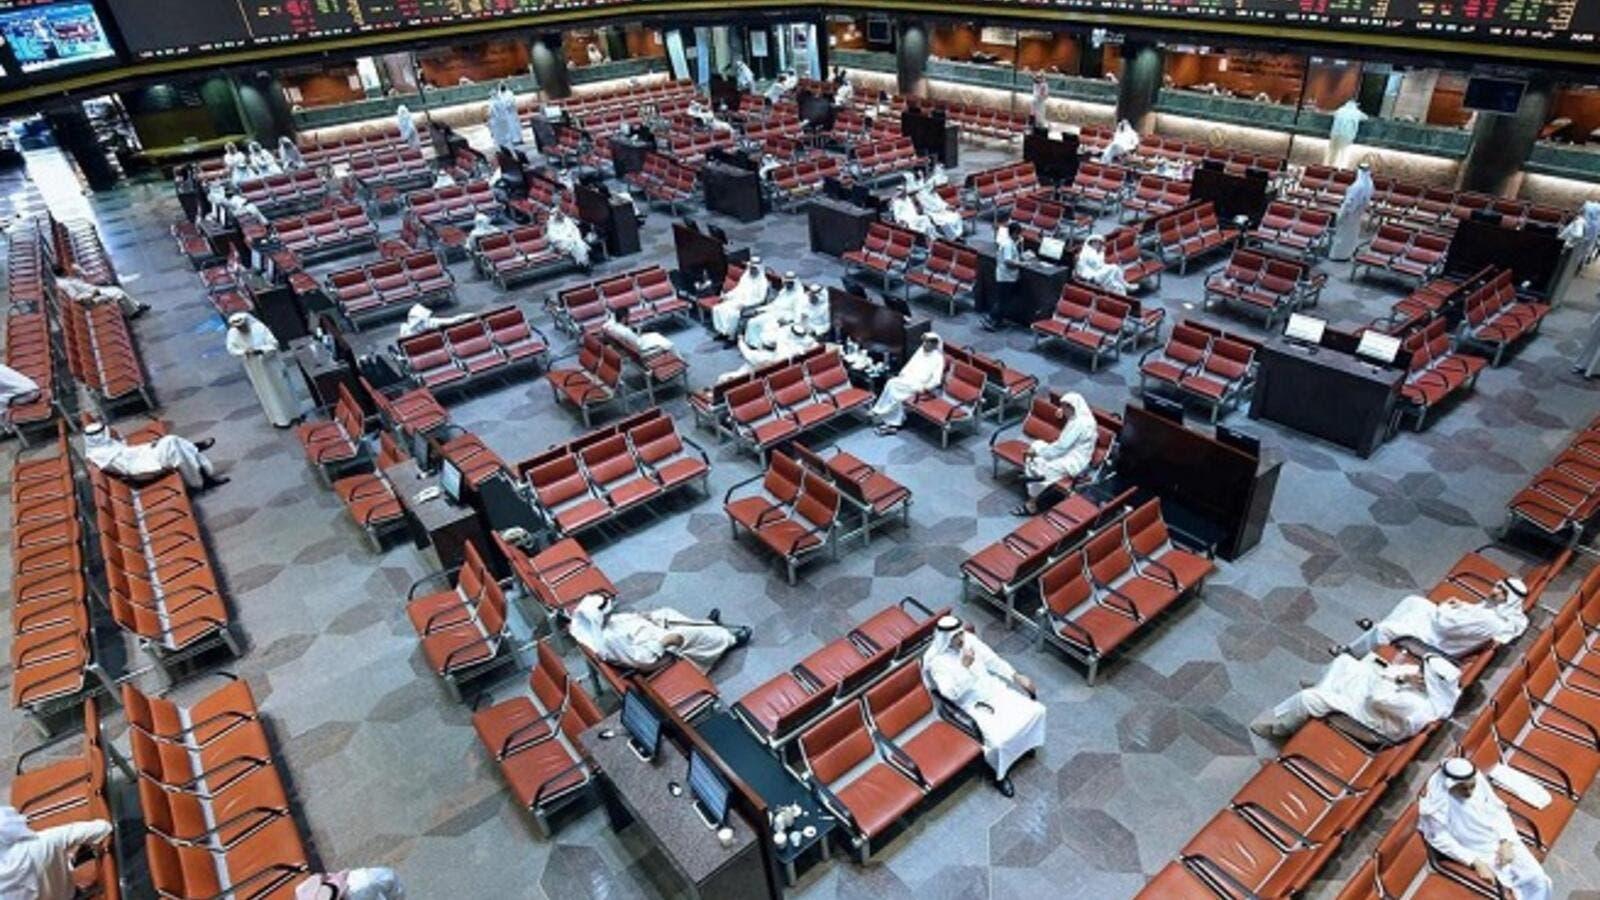 Kuwait Stocks in the Red Zone | Al Bawaba